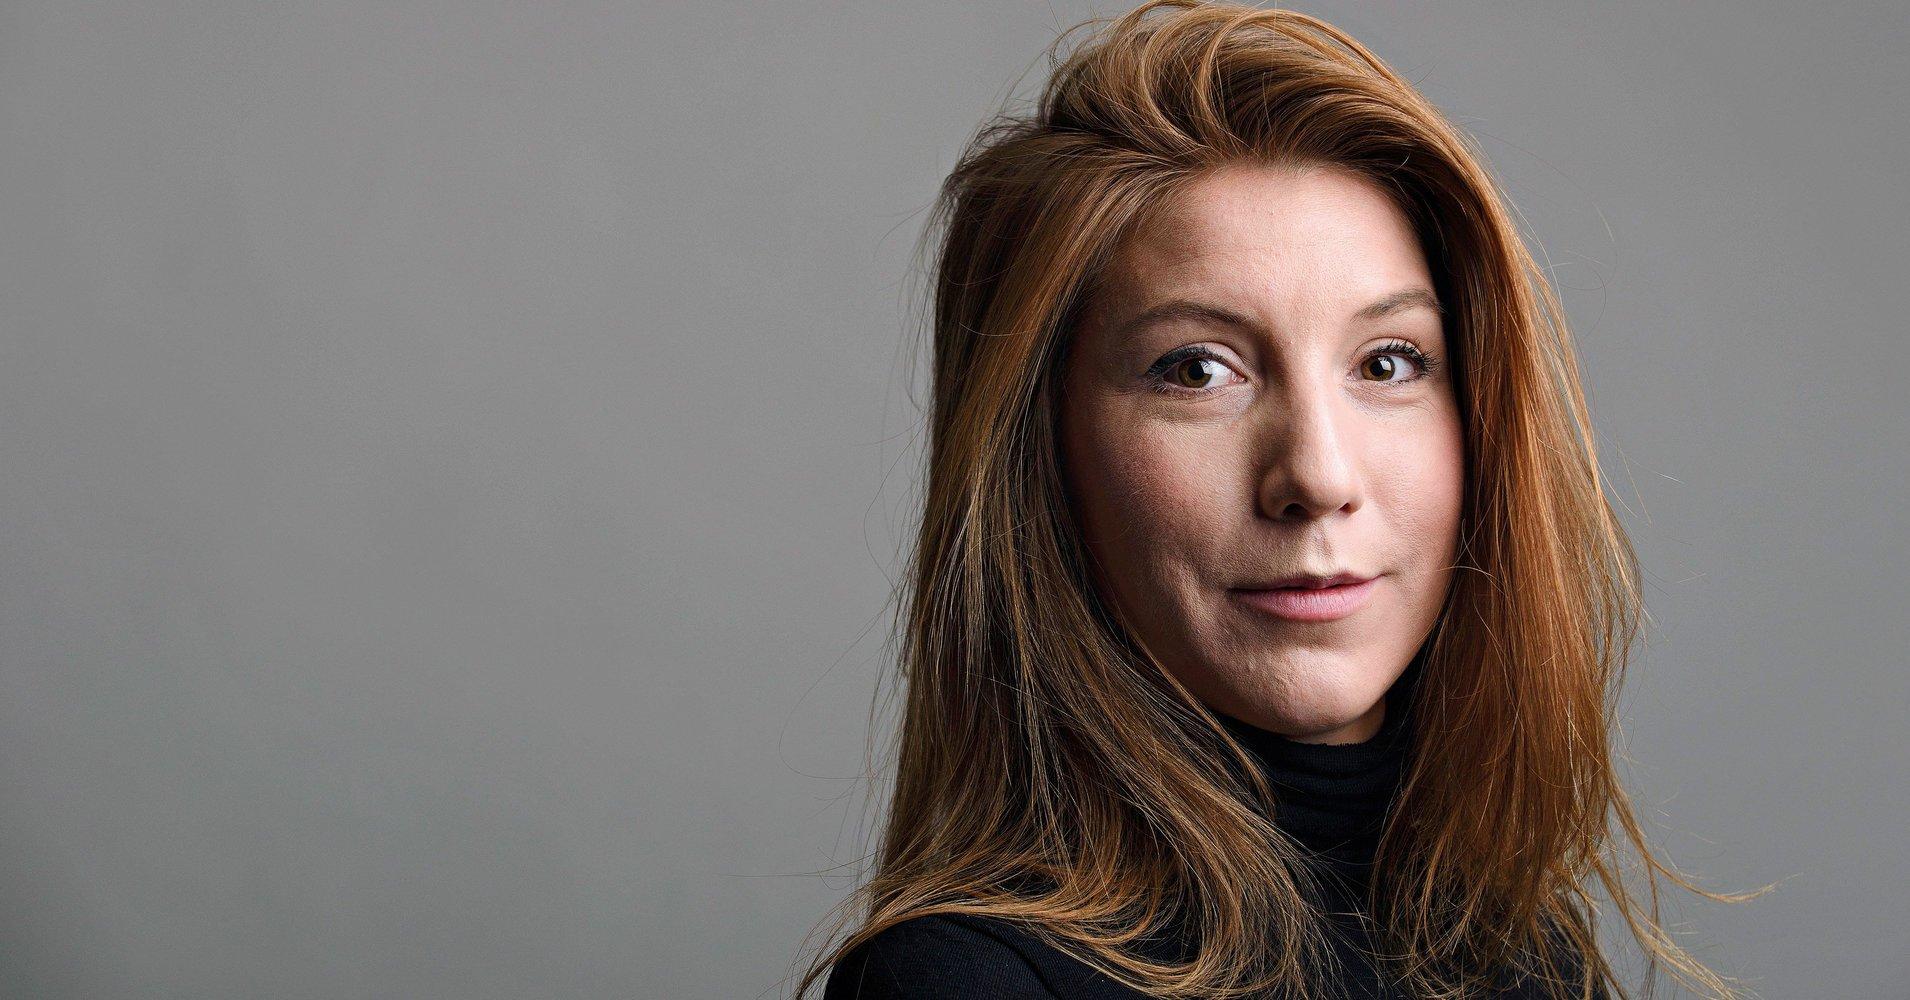 Danish divers find missing body parts of Swedish journalist https://t.co/YsHaGsmPyI https://t.co/d4KSlOdAUL